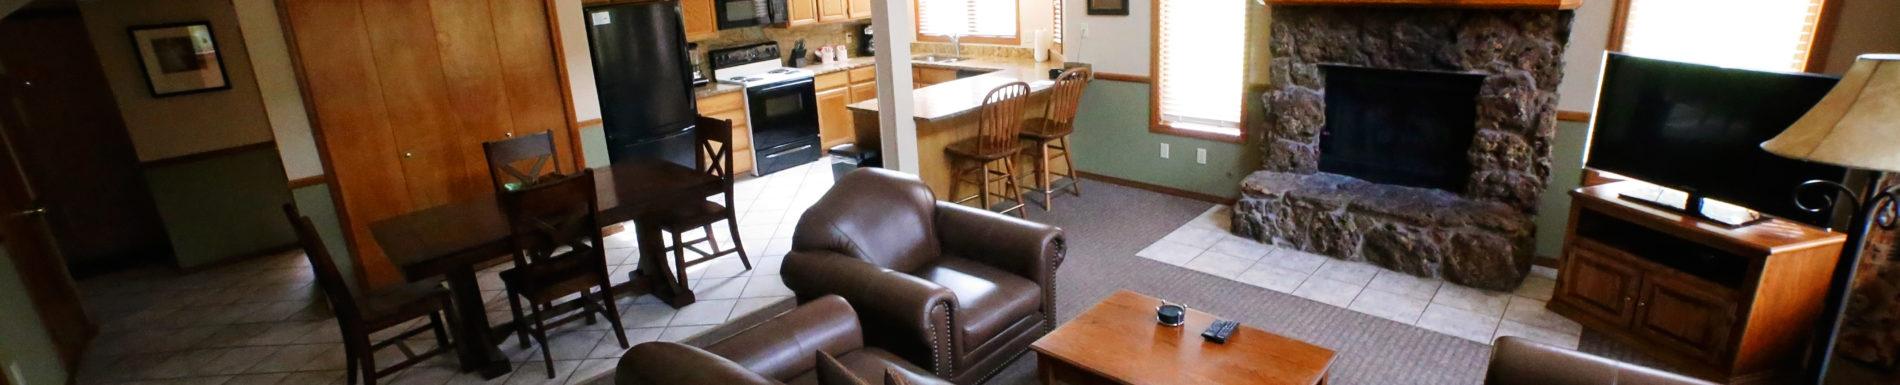 Two Bedroom Loft - Living Room 2